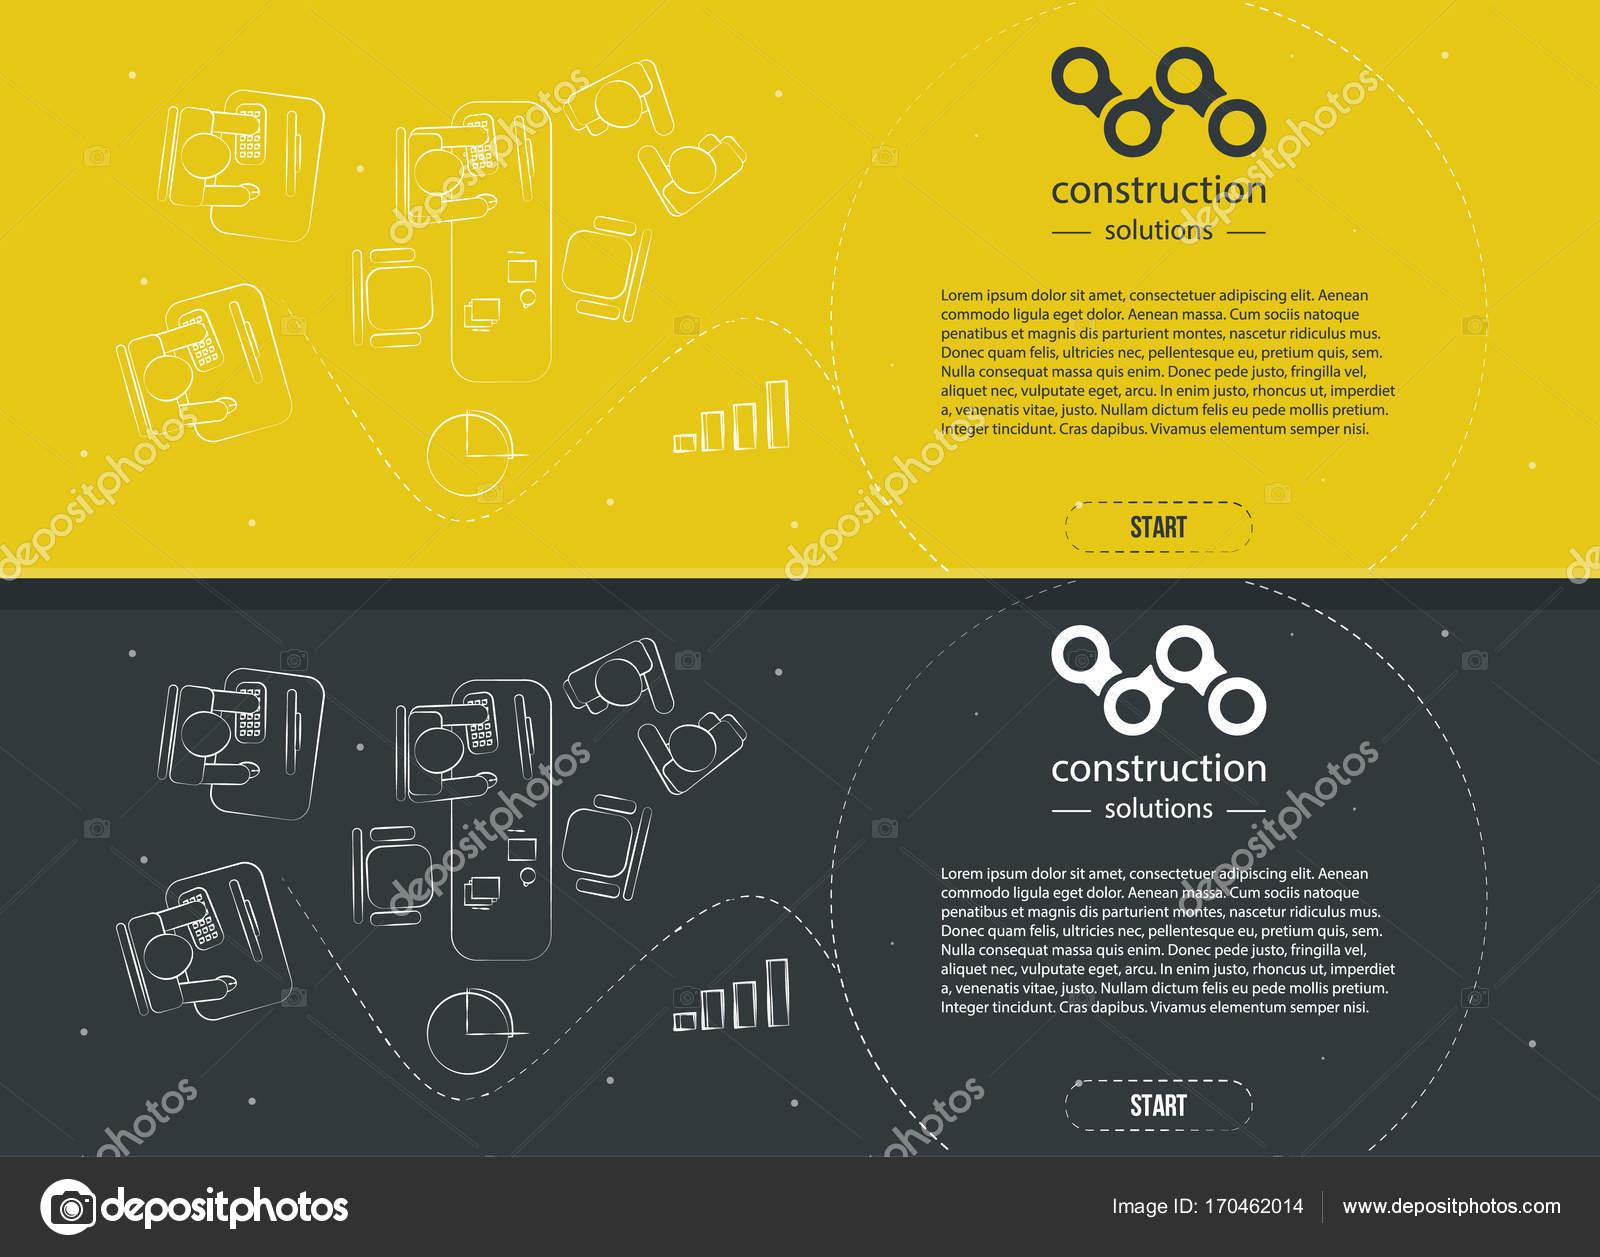 Design De Estilo De Linha Para Web Site Modelo De Banner